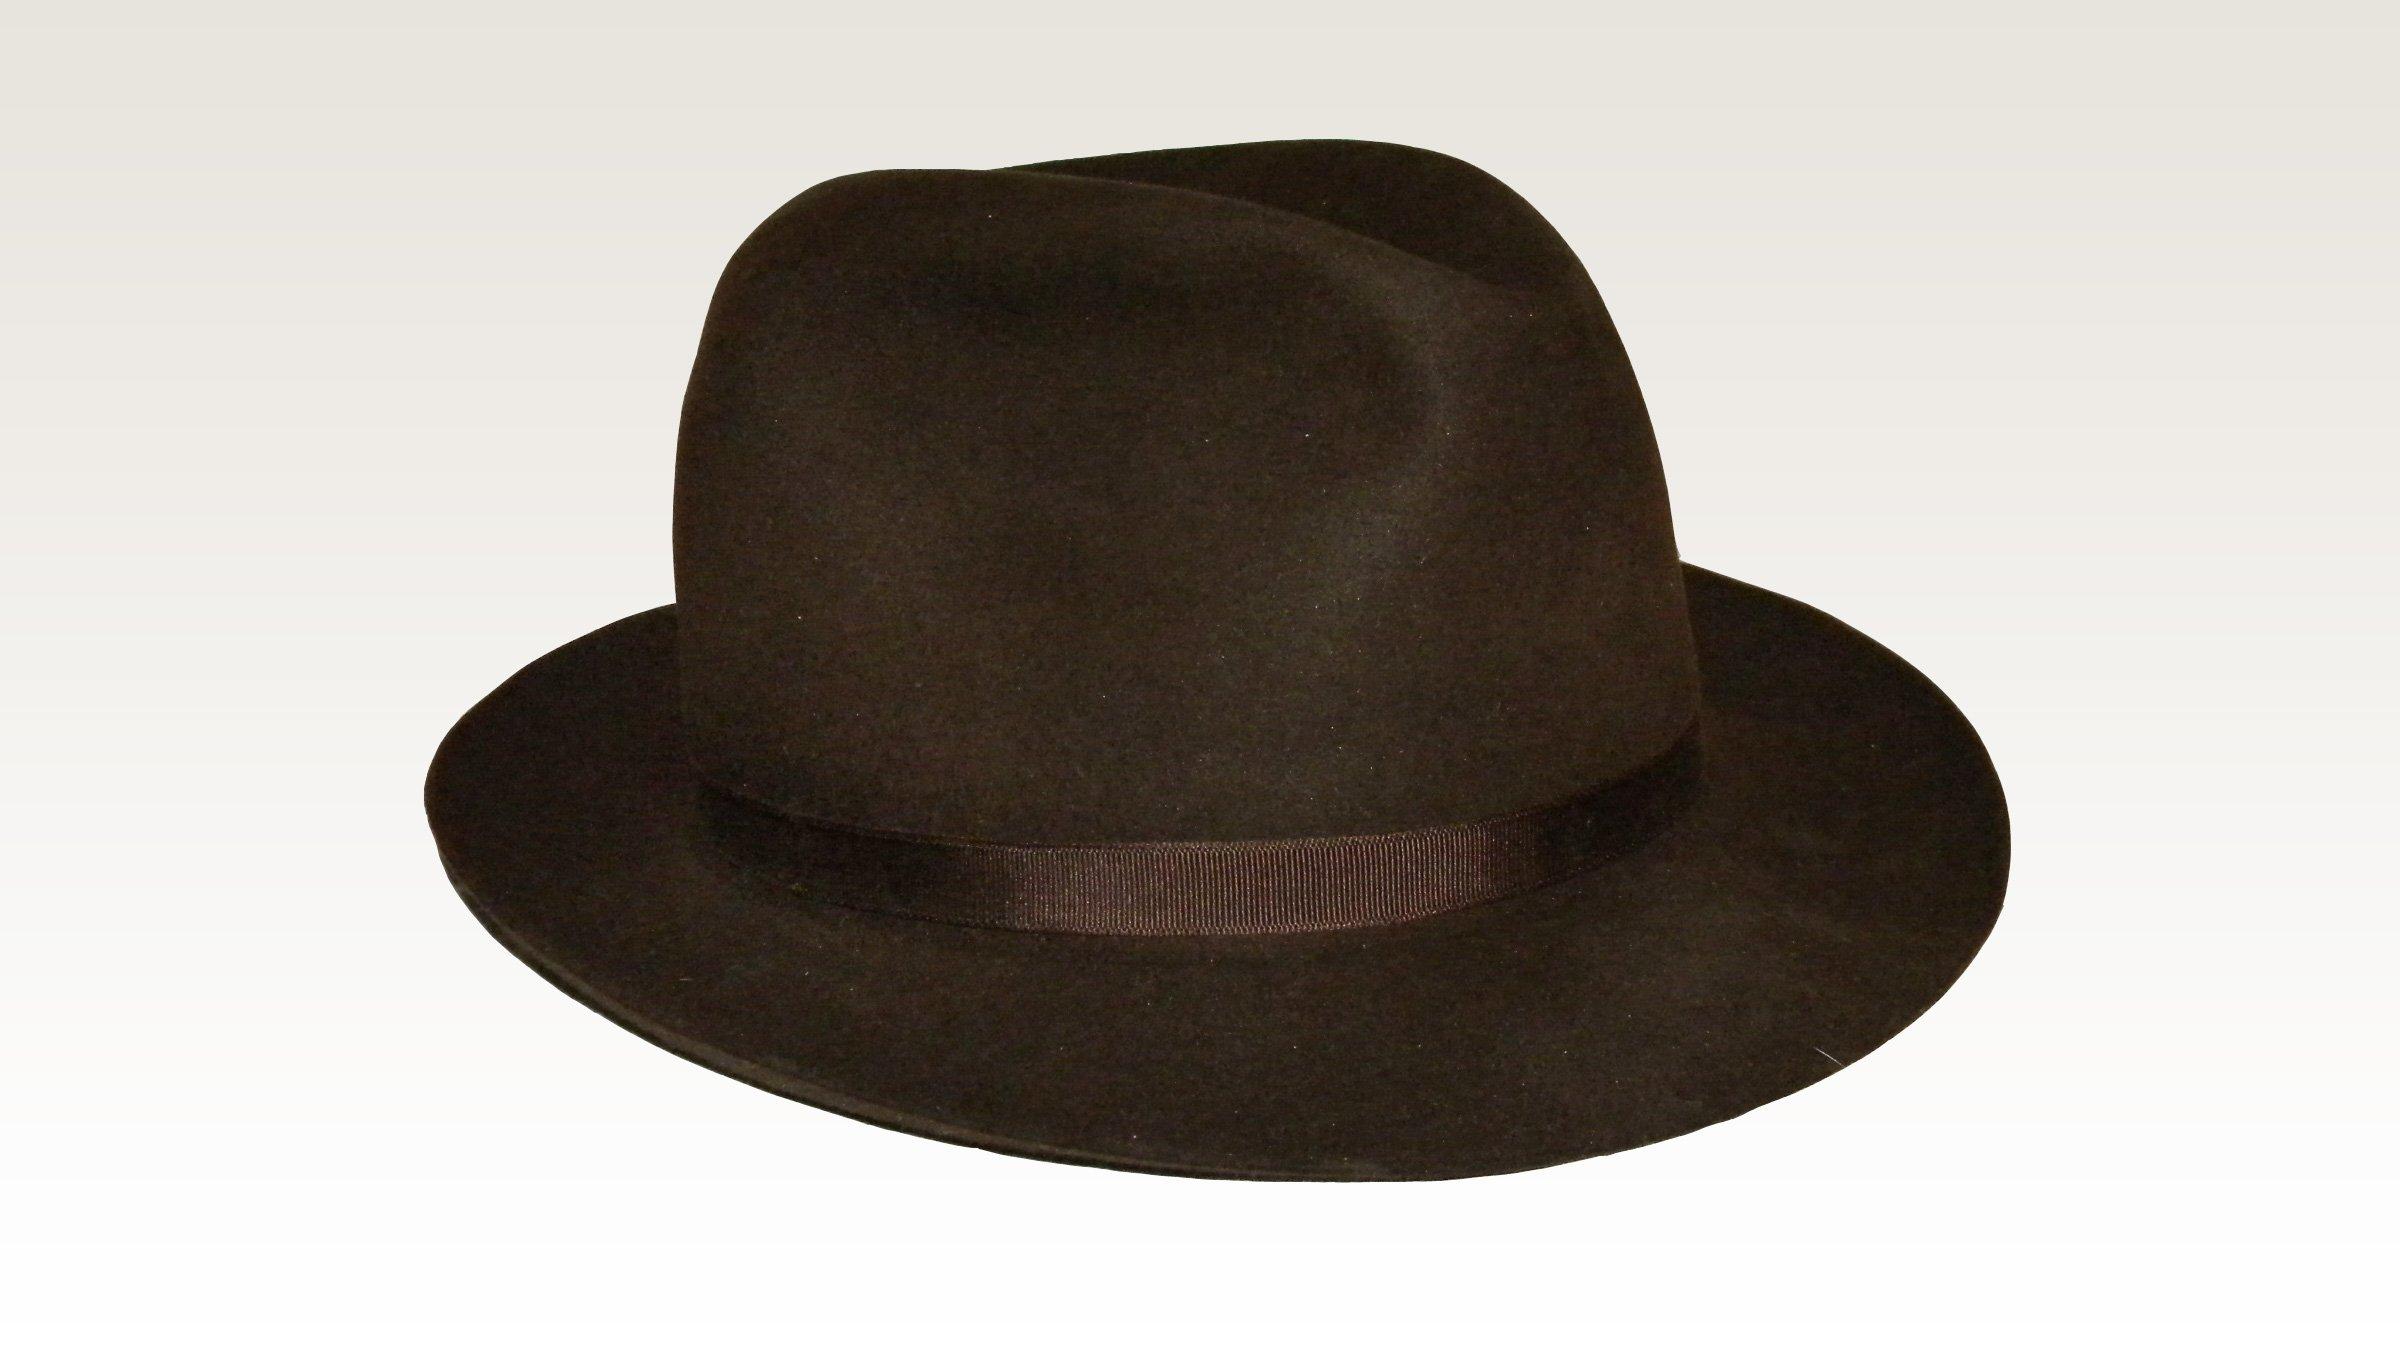 f3ff7ecbb33c8 My Lock Hats – The Suits of James Bond